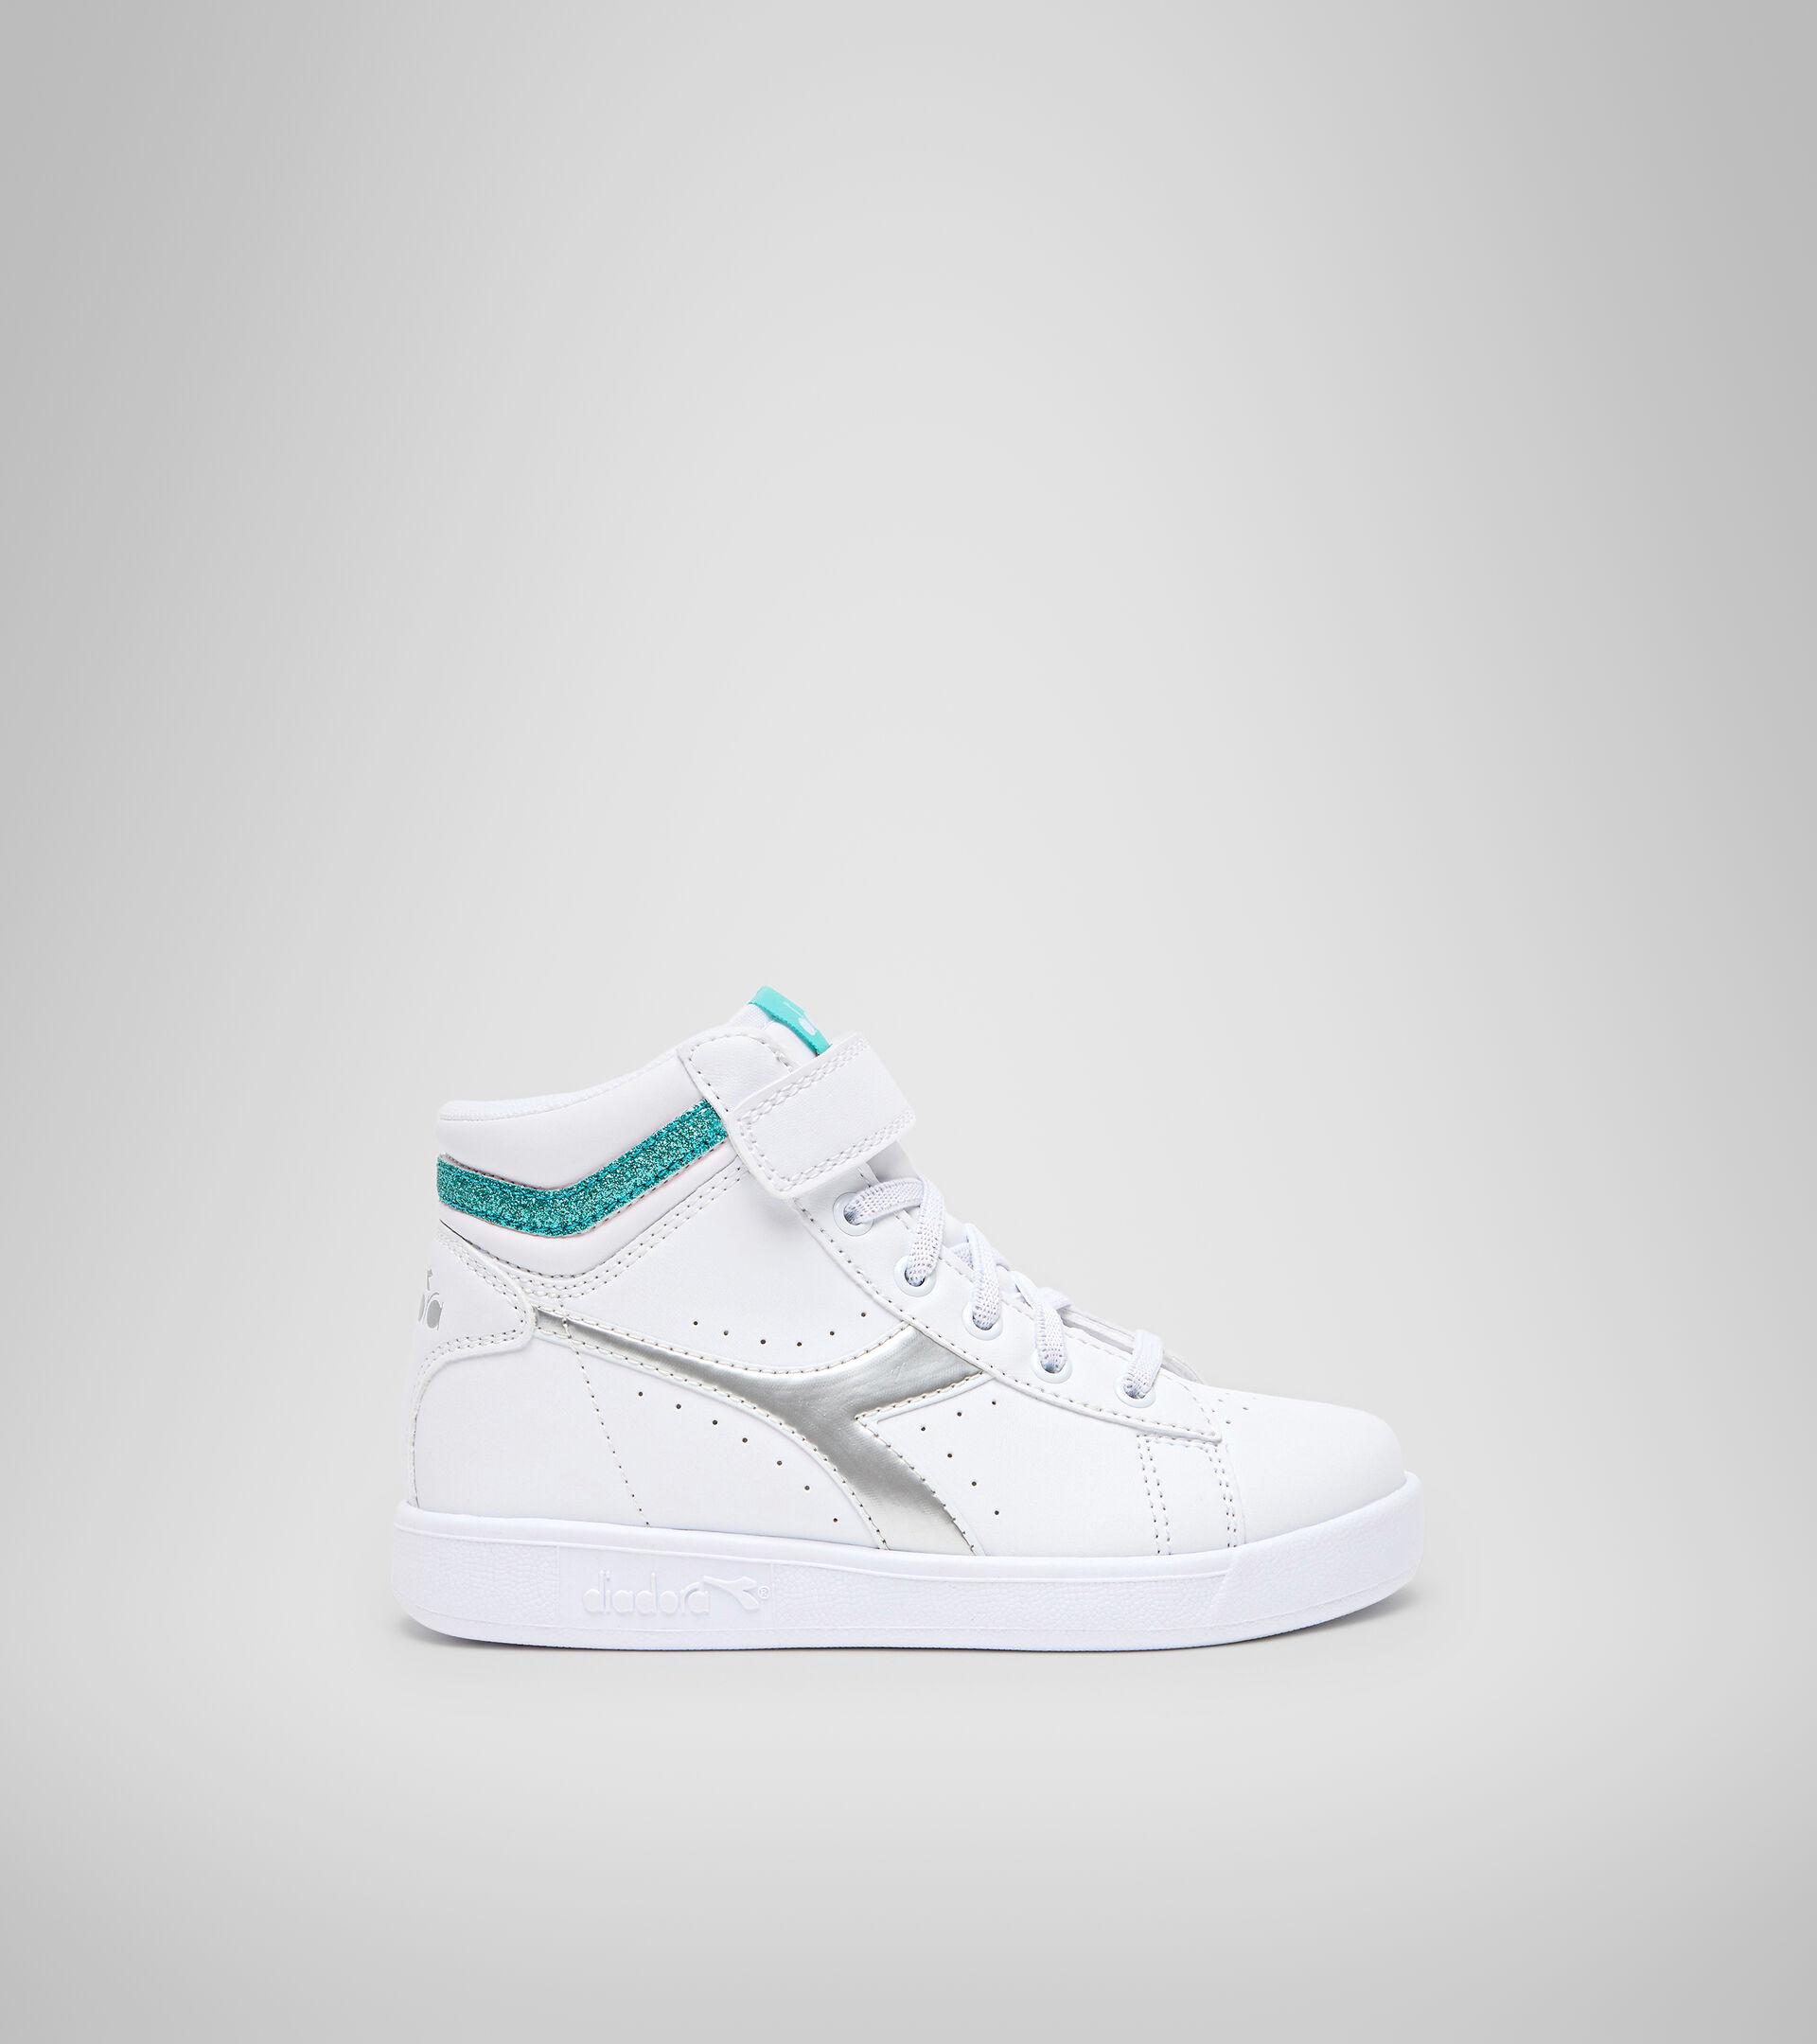 Footwear Sport BAMBINO GAME P HIGH GIRL PS WHITE/BLUE TURQUOISE Diadora